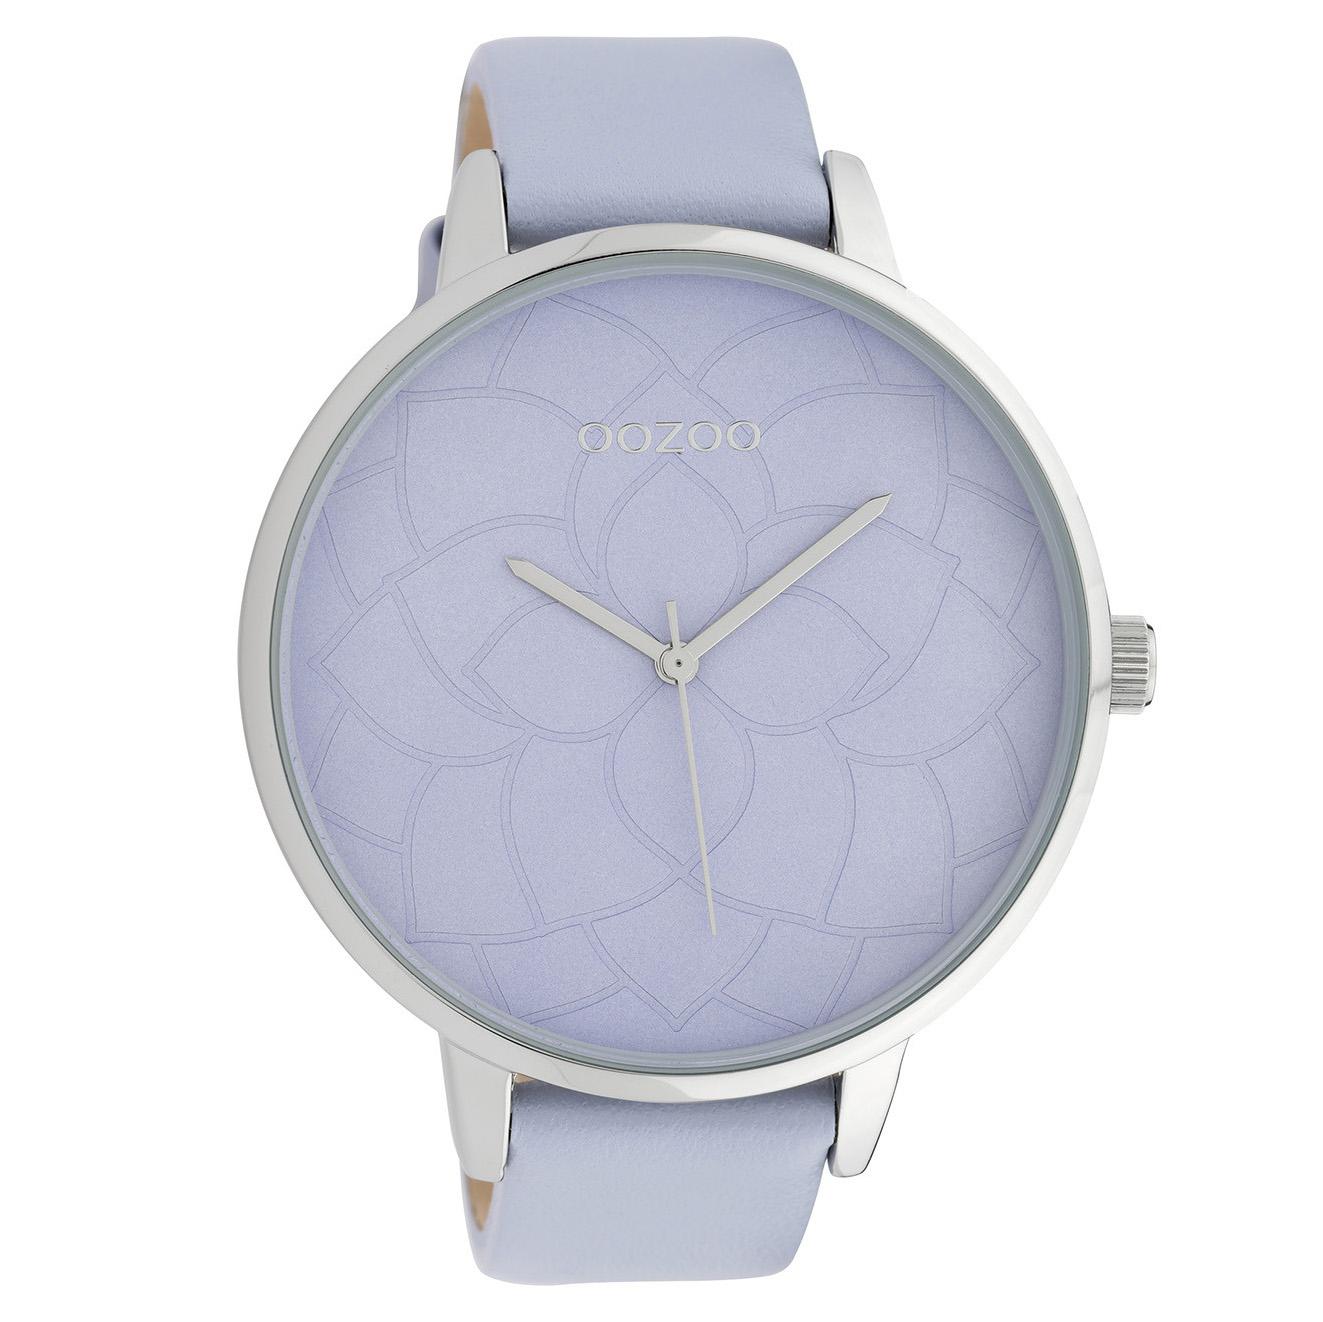 OOZOO C10103 Horloge Timepieces Collection staal leder zilverkleurig pastel lila 48 mm